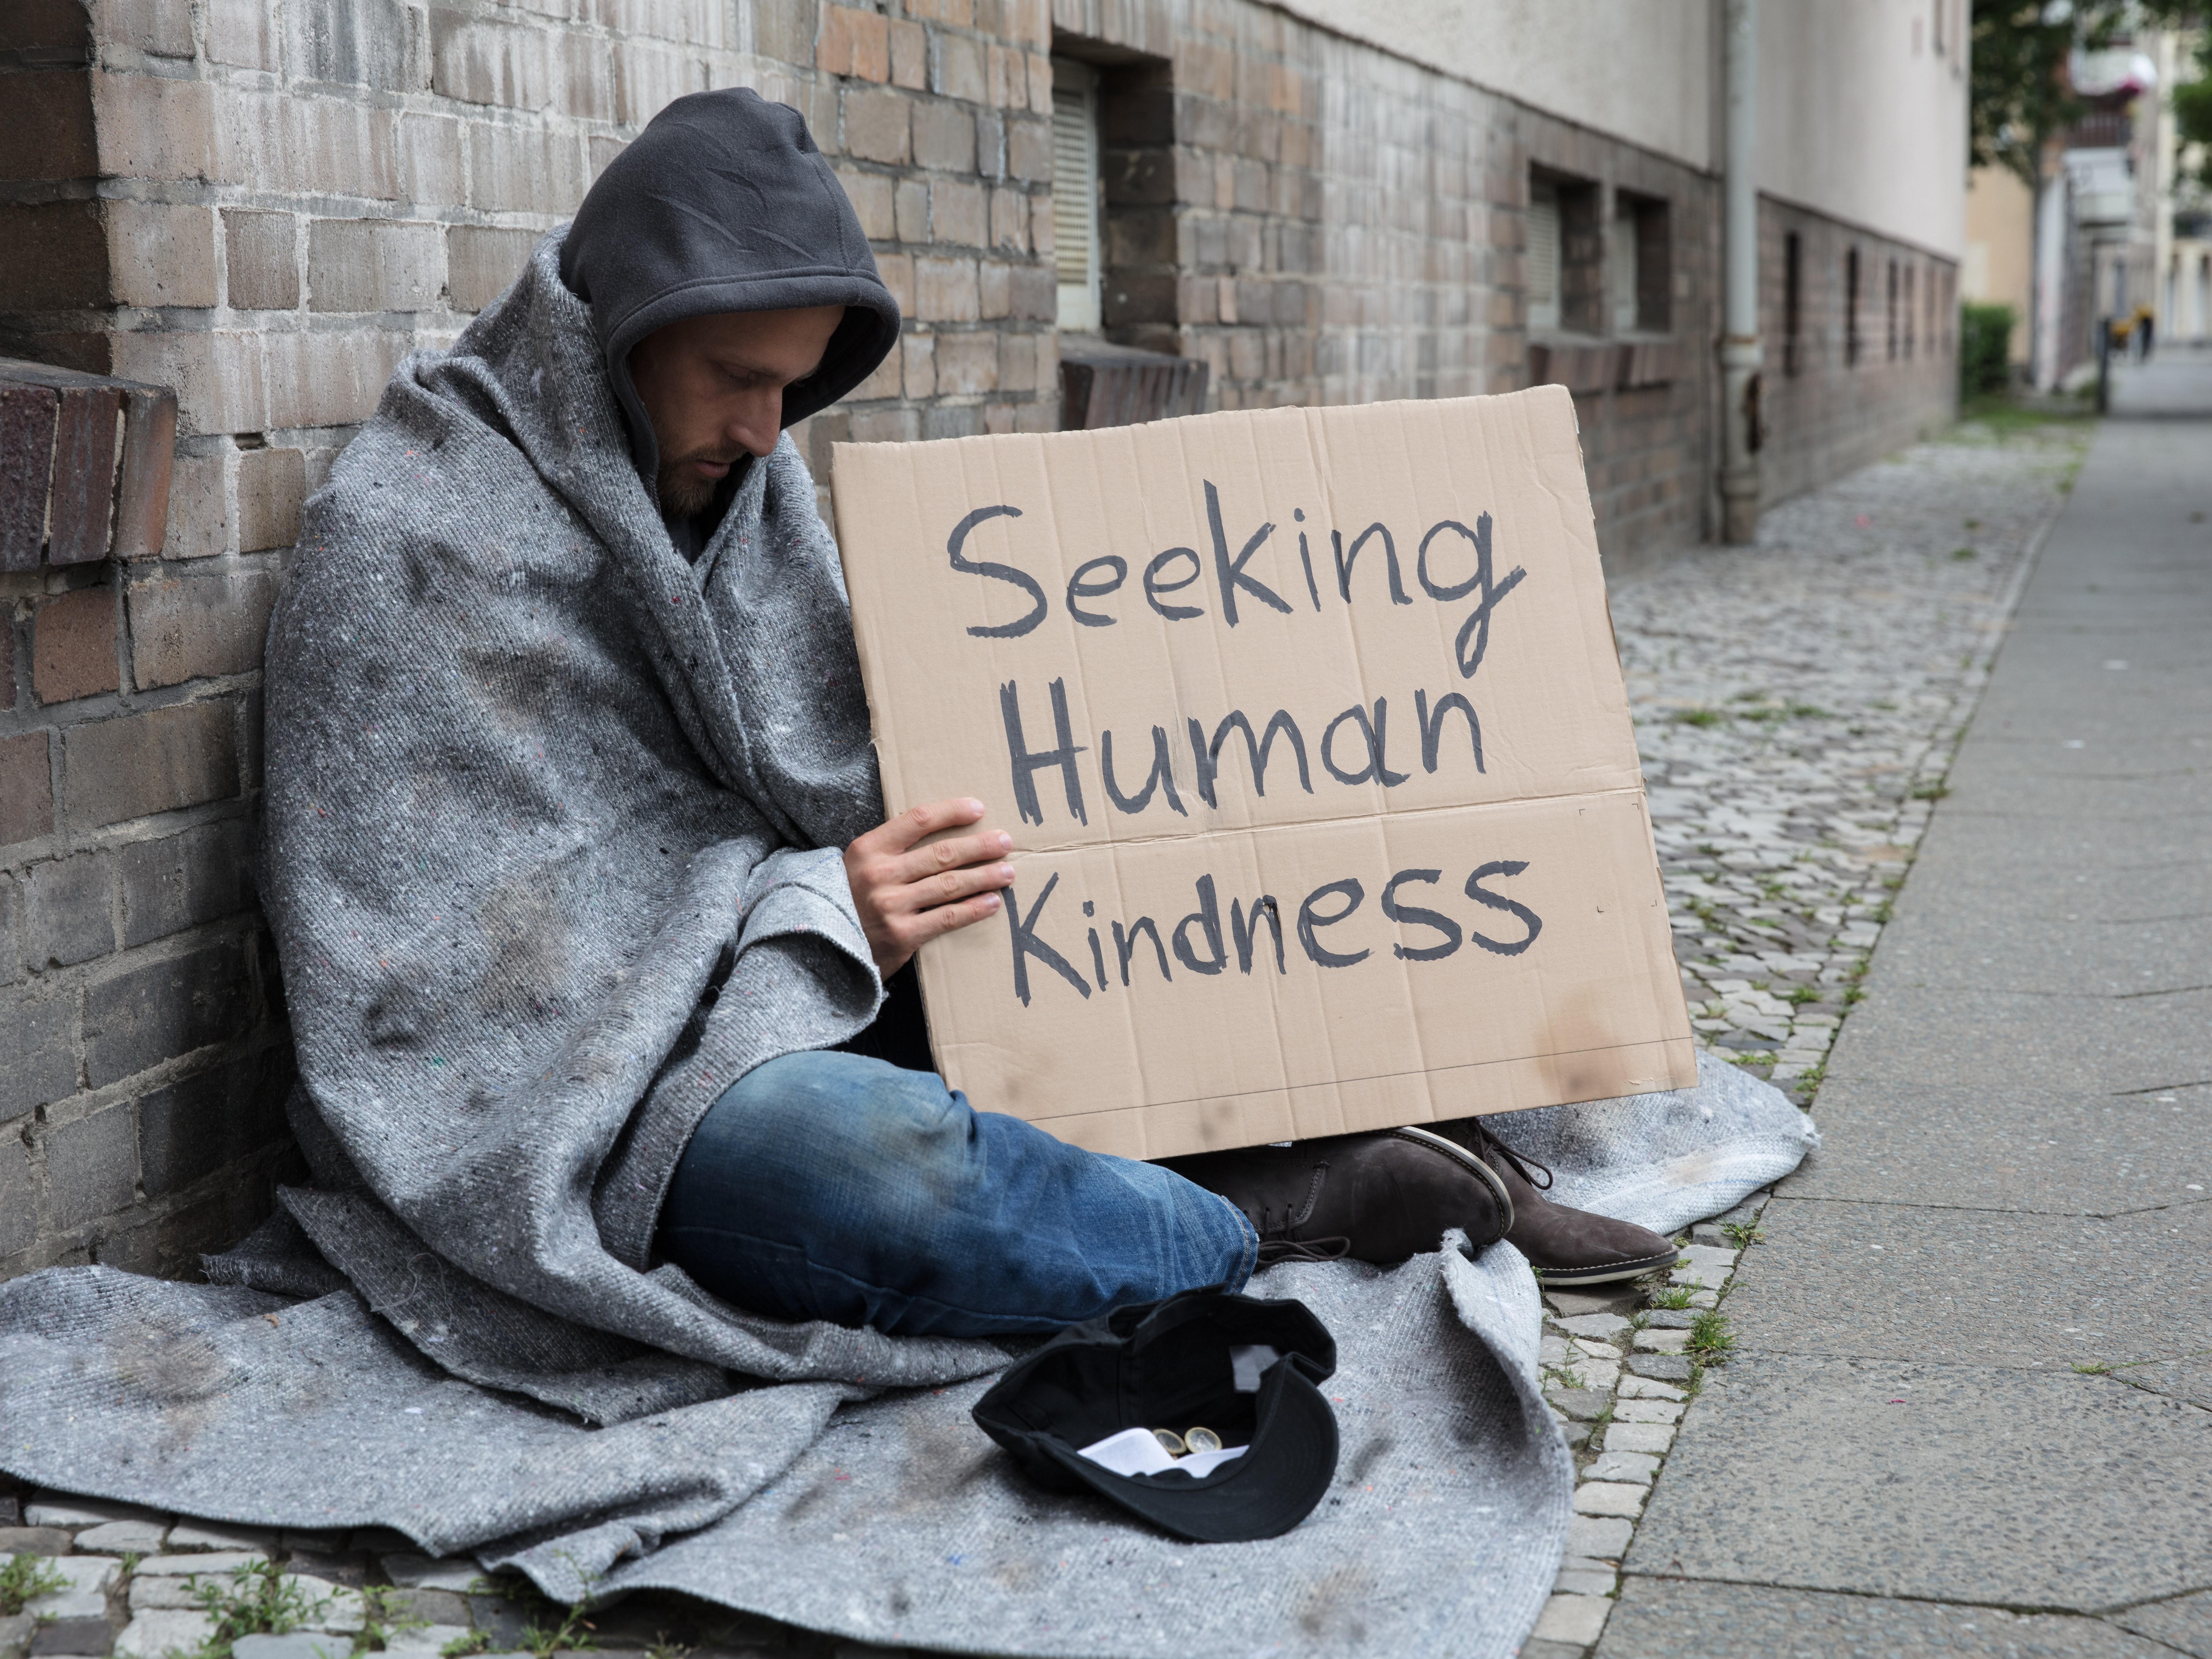 Seeking human kindess